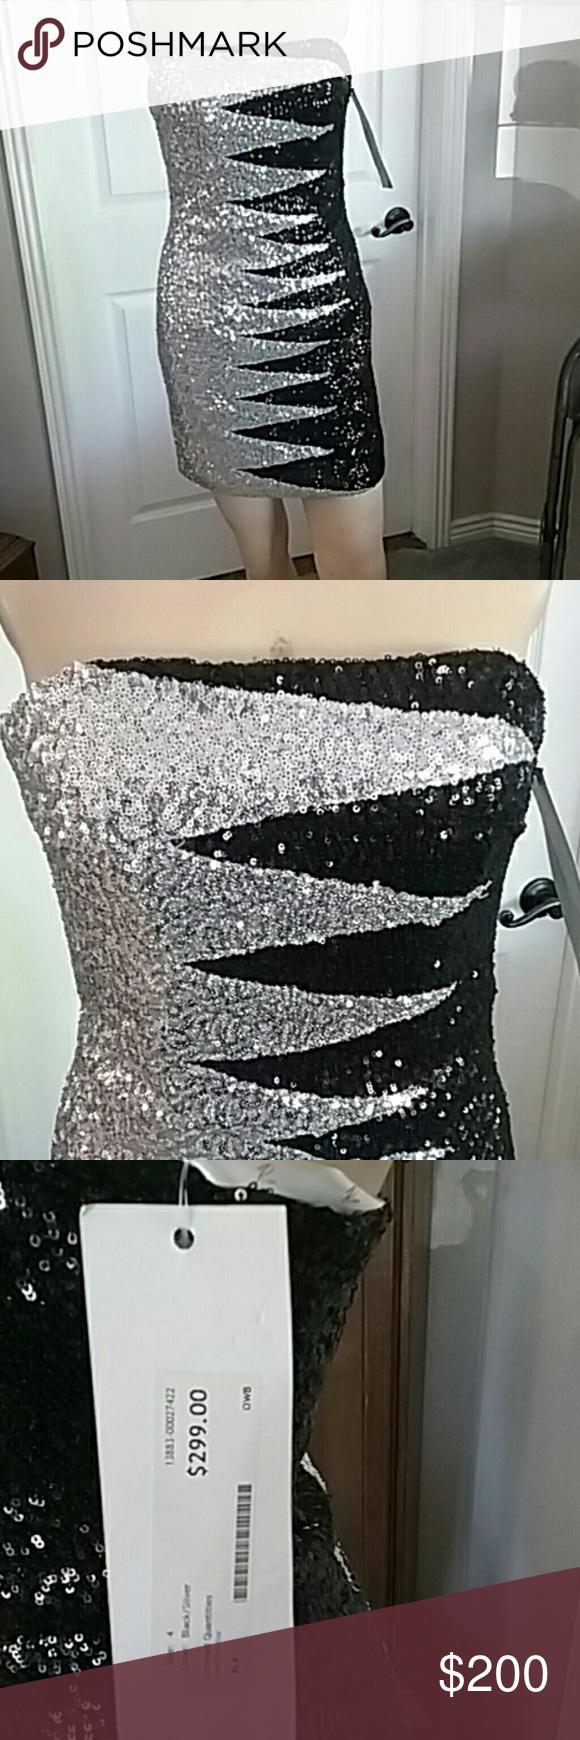 Nwt size regiss homecoming prom dress nwt pinterest